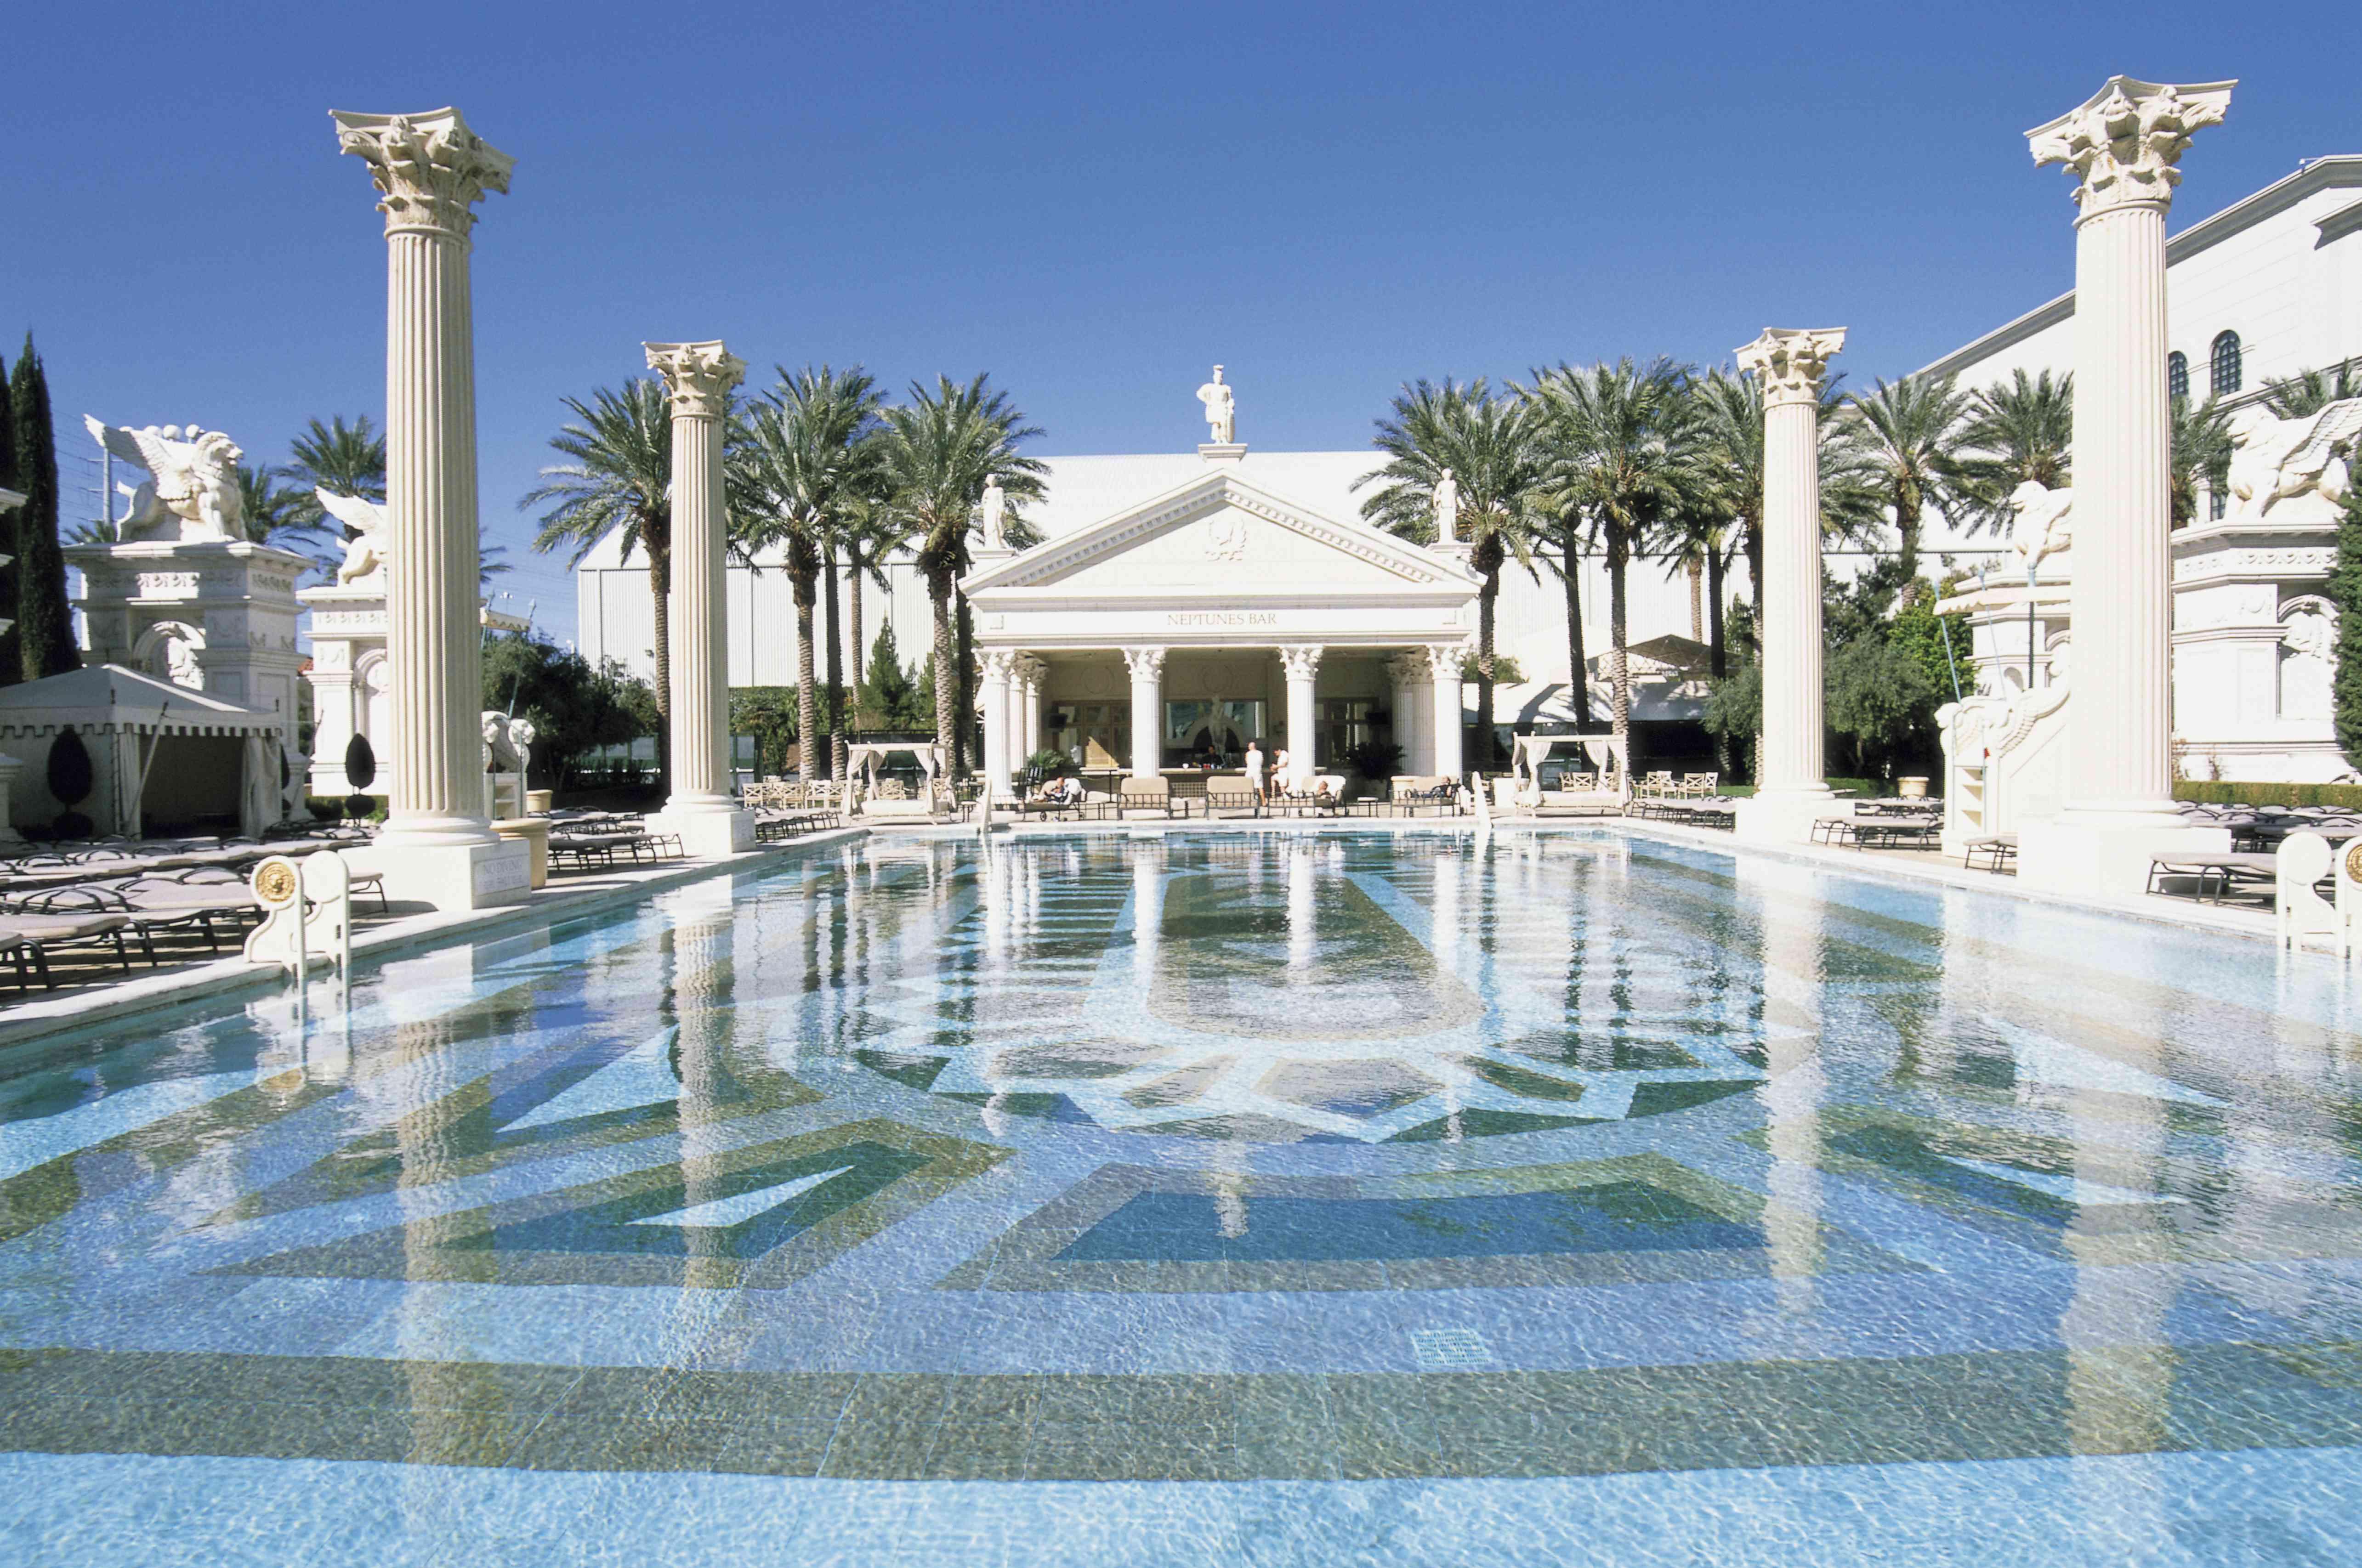 Piscina, Caesar's Palace Hotel & Casino, Las Vegas, Nevada, EE. UU.